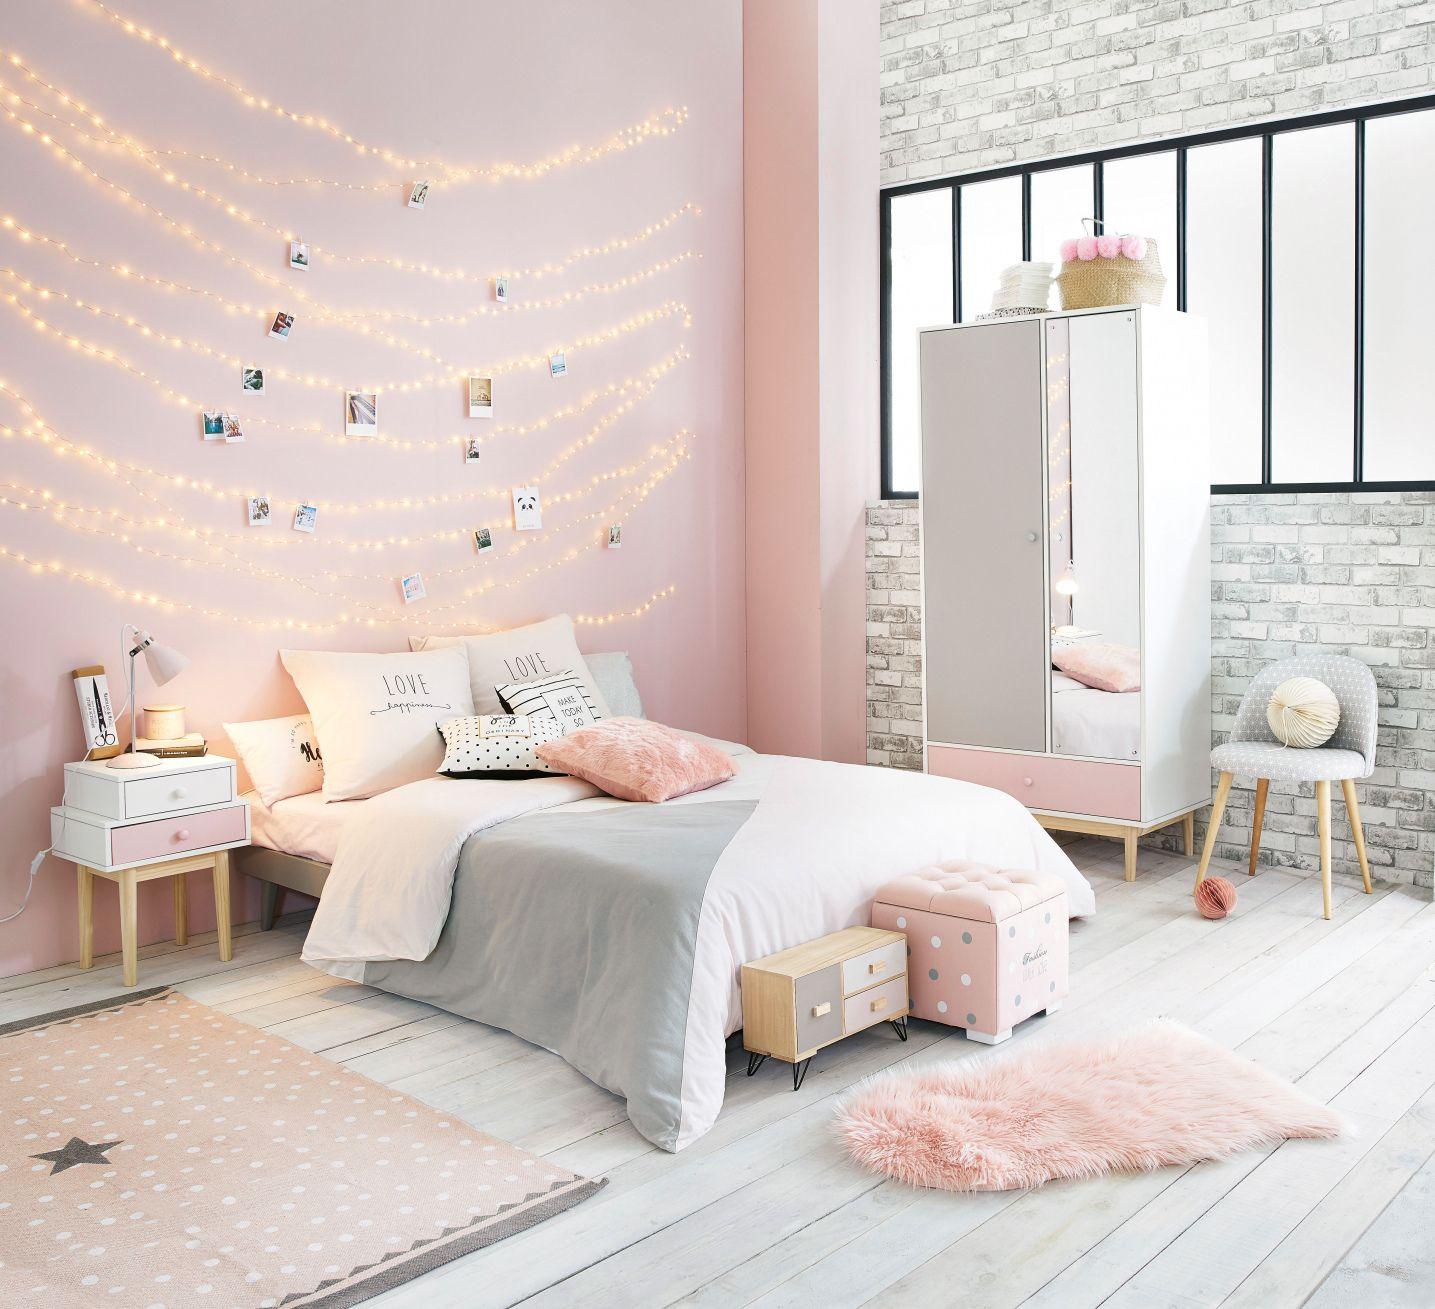 Vintage mädchen zimmer dekor pin by dhwsn on cute rooms  pinterest  pink room room decor